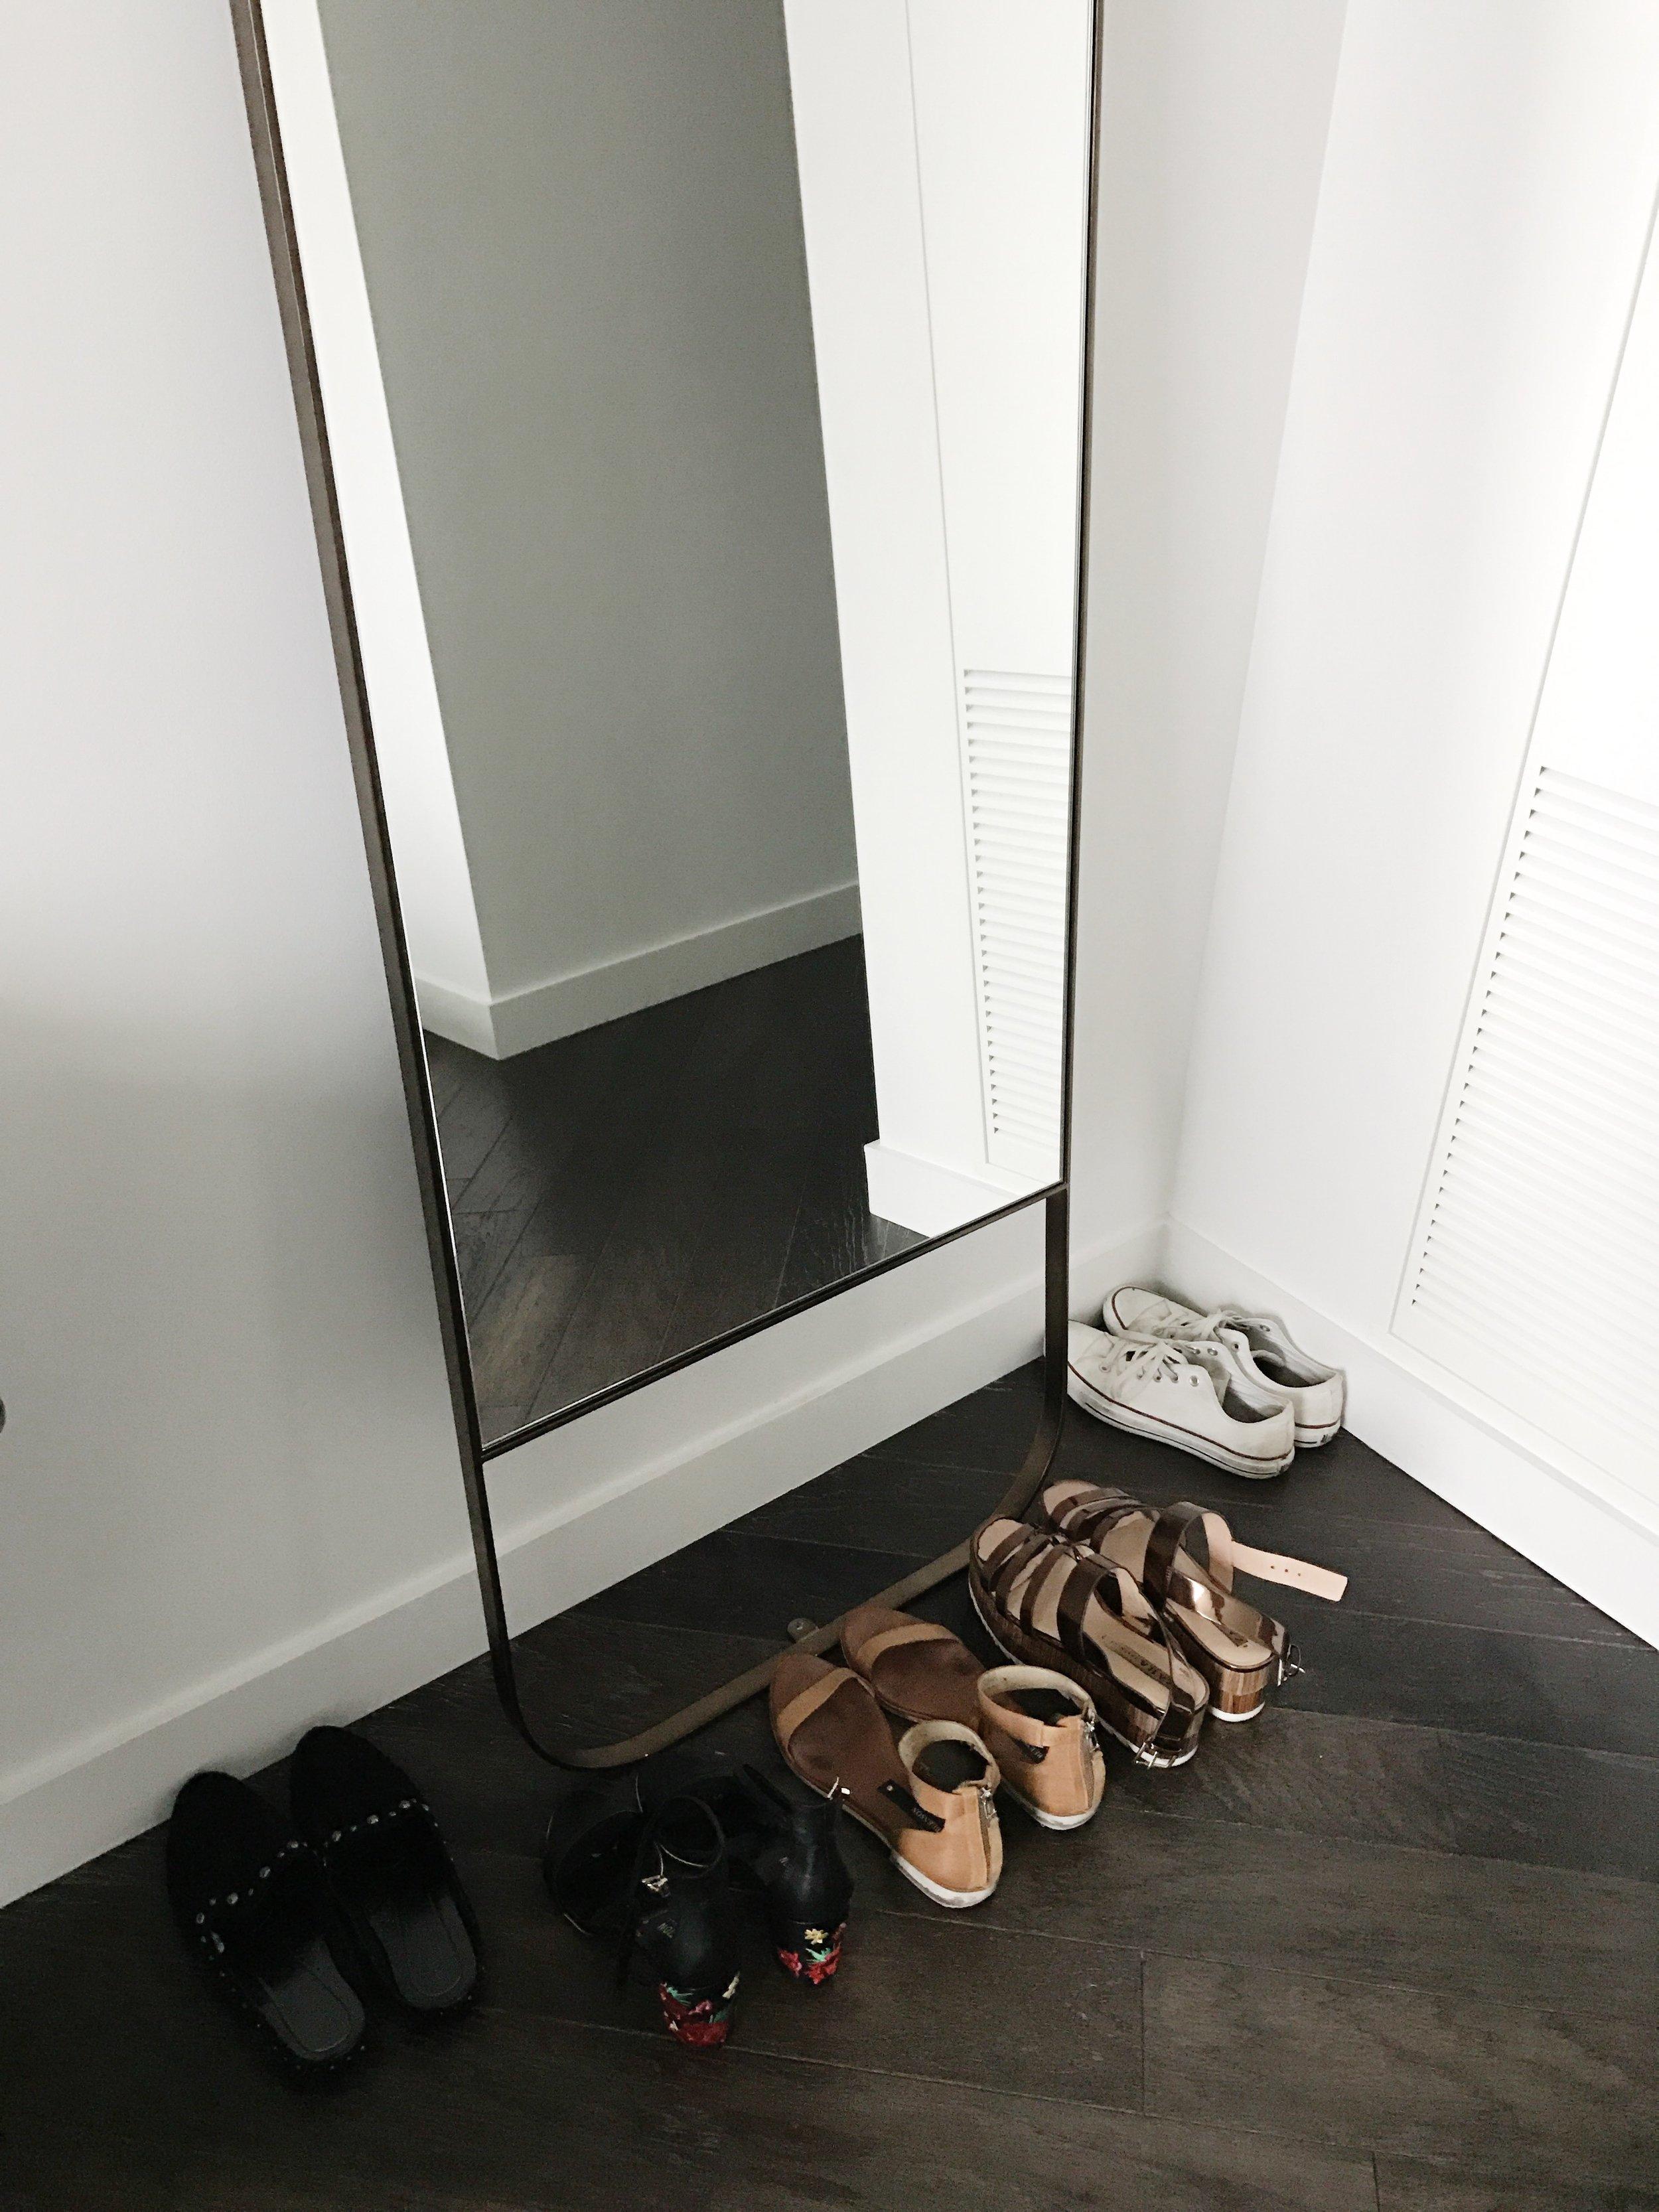 Shoes (Left to Right)  |  DJPliner Slides  |  Kenneth Cole Embroidered Heel  (on sale $49.97) | Matt Bernson Leather Flat |  Metallic Platform  |  Converse